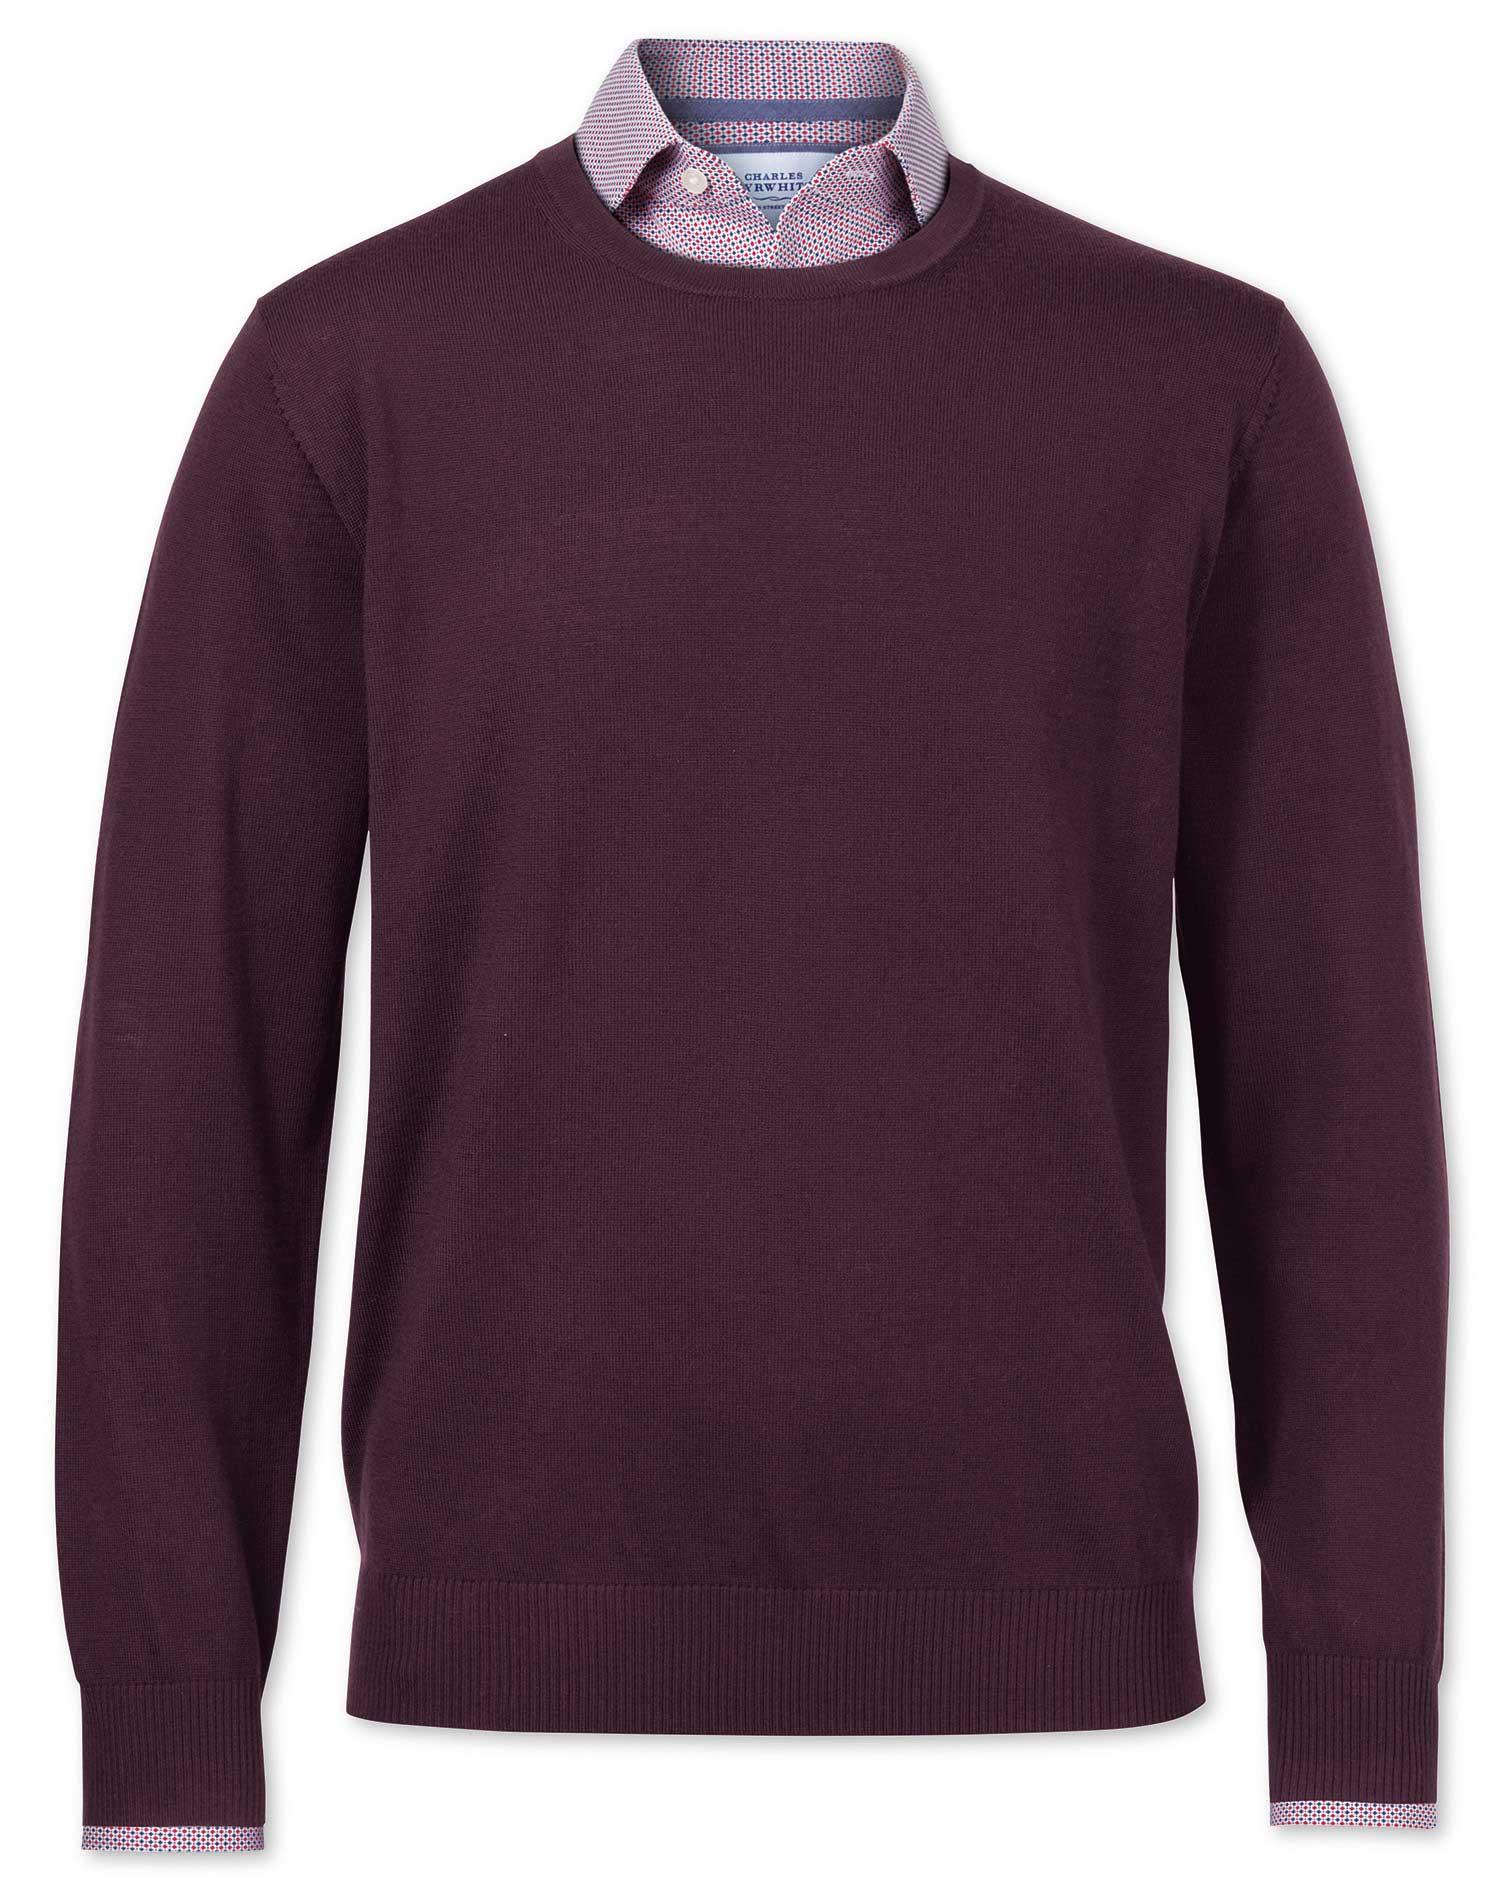 Wine Merino Wool Crew Neck Jumper Size XXL by Charles Tyrwhitt